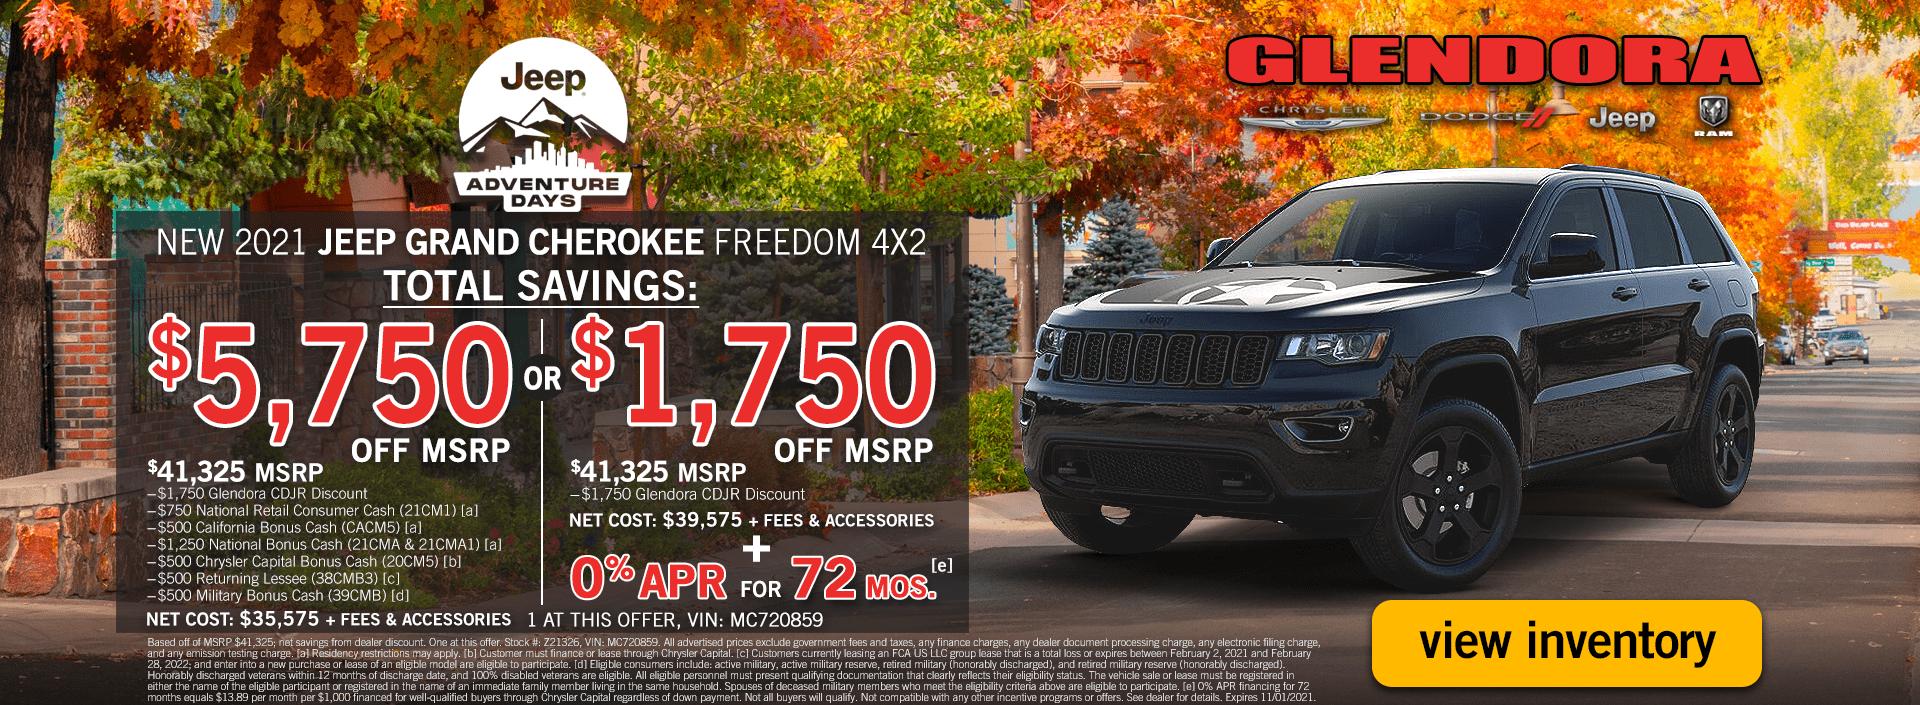 Jeep Adventure Days Jeep Grand Cherokee Specials Deals